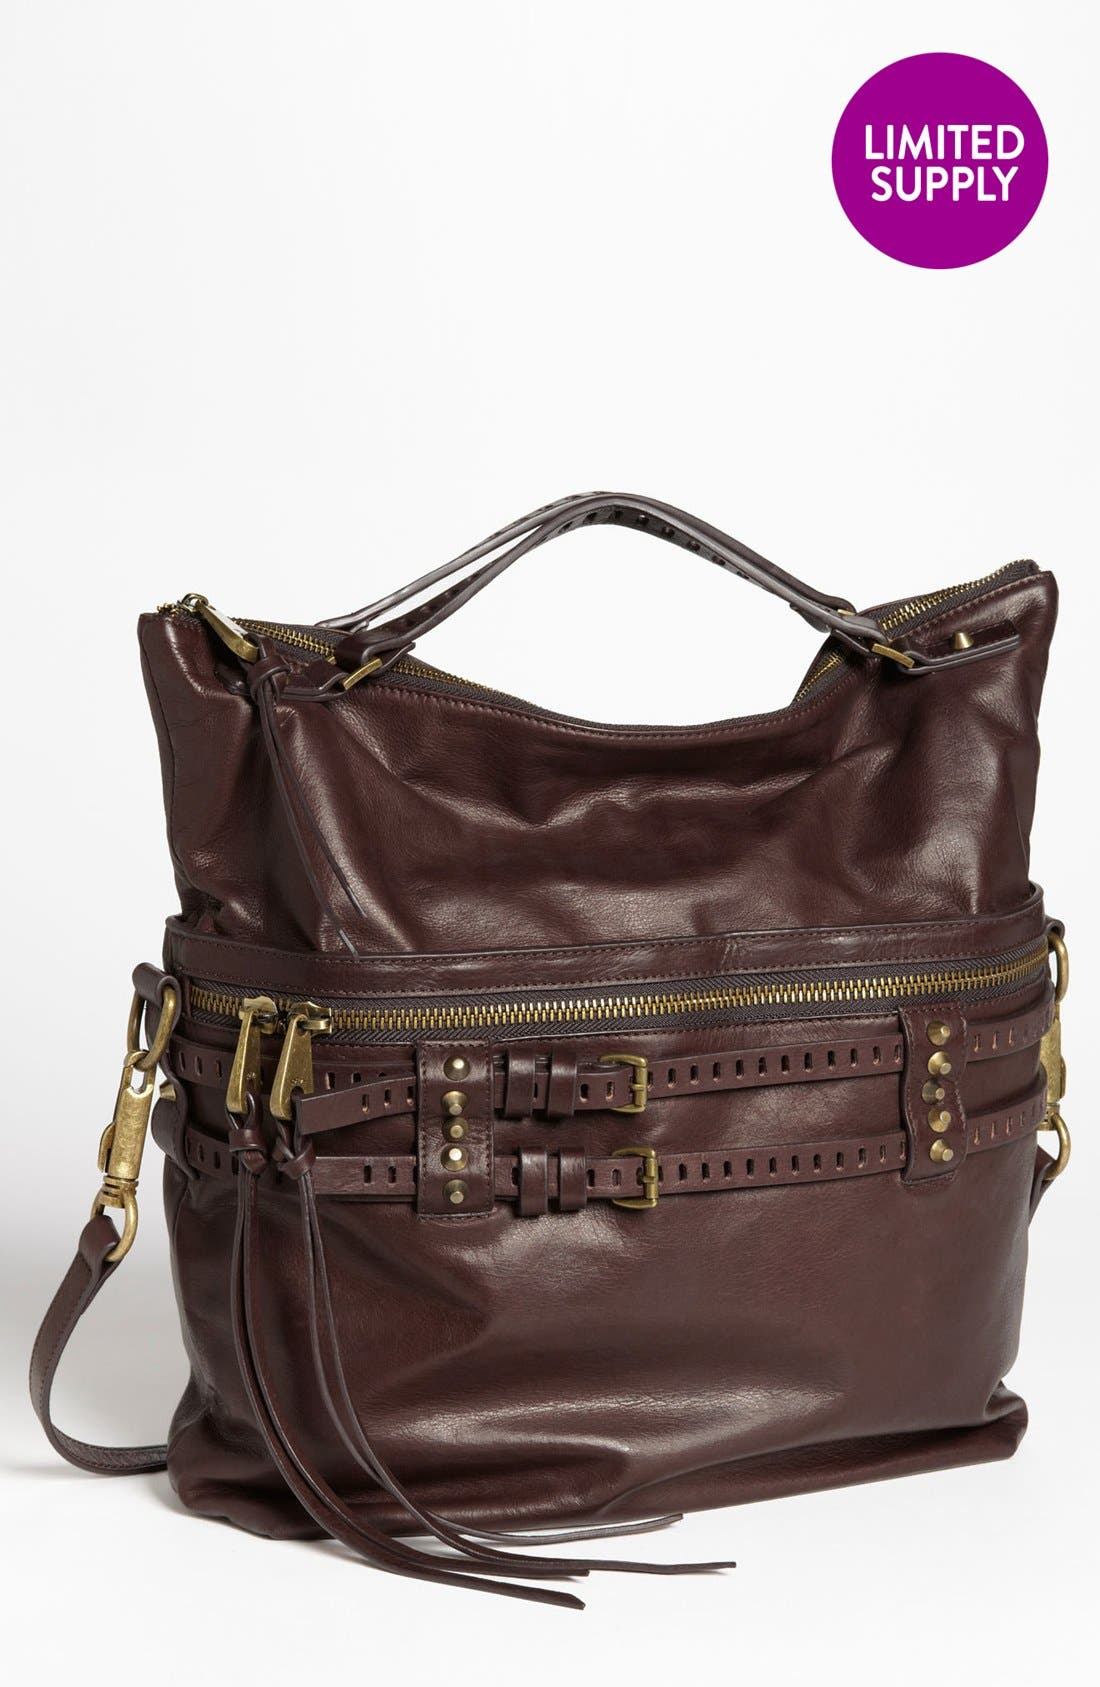 Main Image - Joelle Hawkens by Treesje® 'Victory' Shoulder Bag, Large